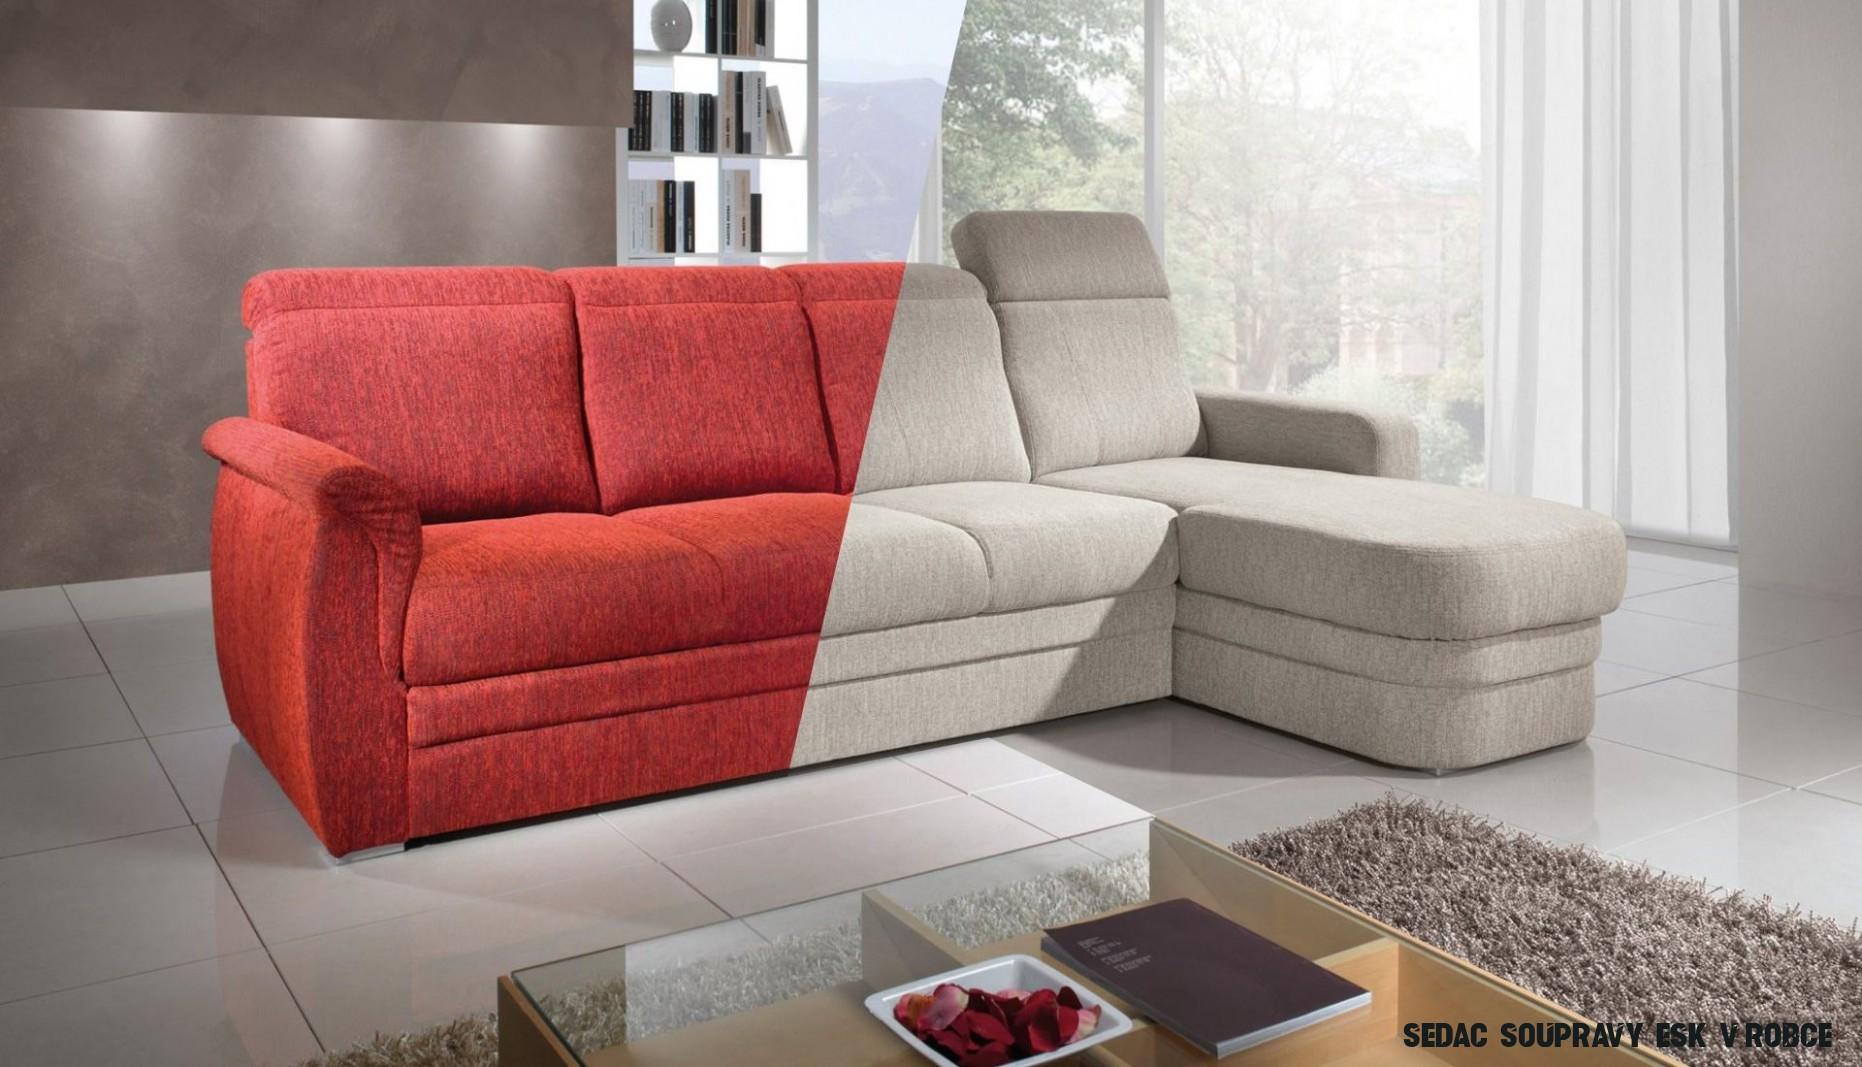 FAGUS nábytek - založeno v ČR 18  Výroba čalouněného nábytku FAGUS